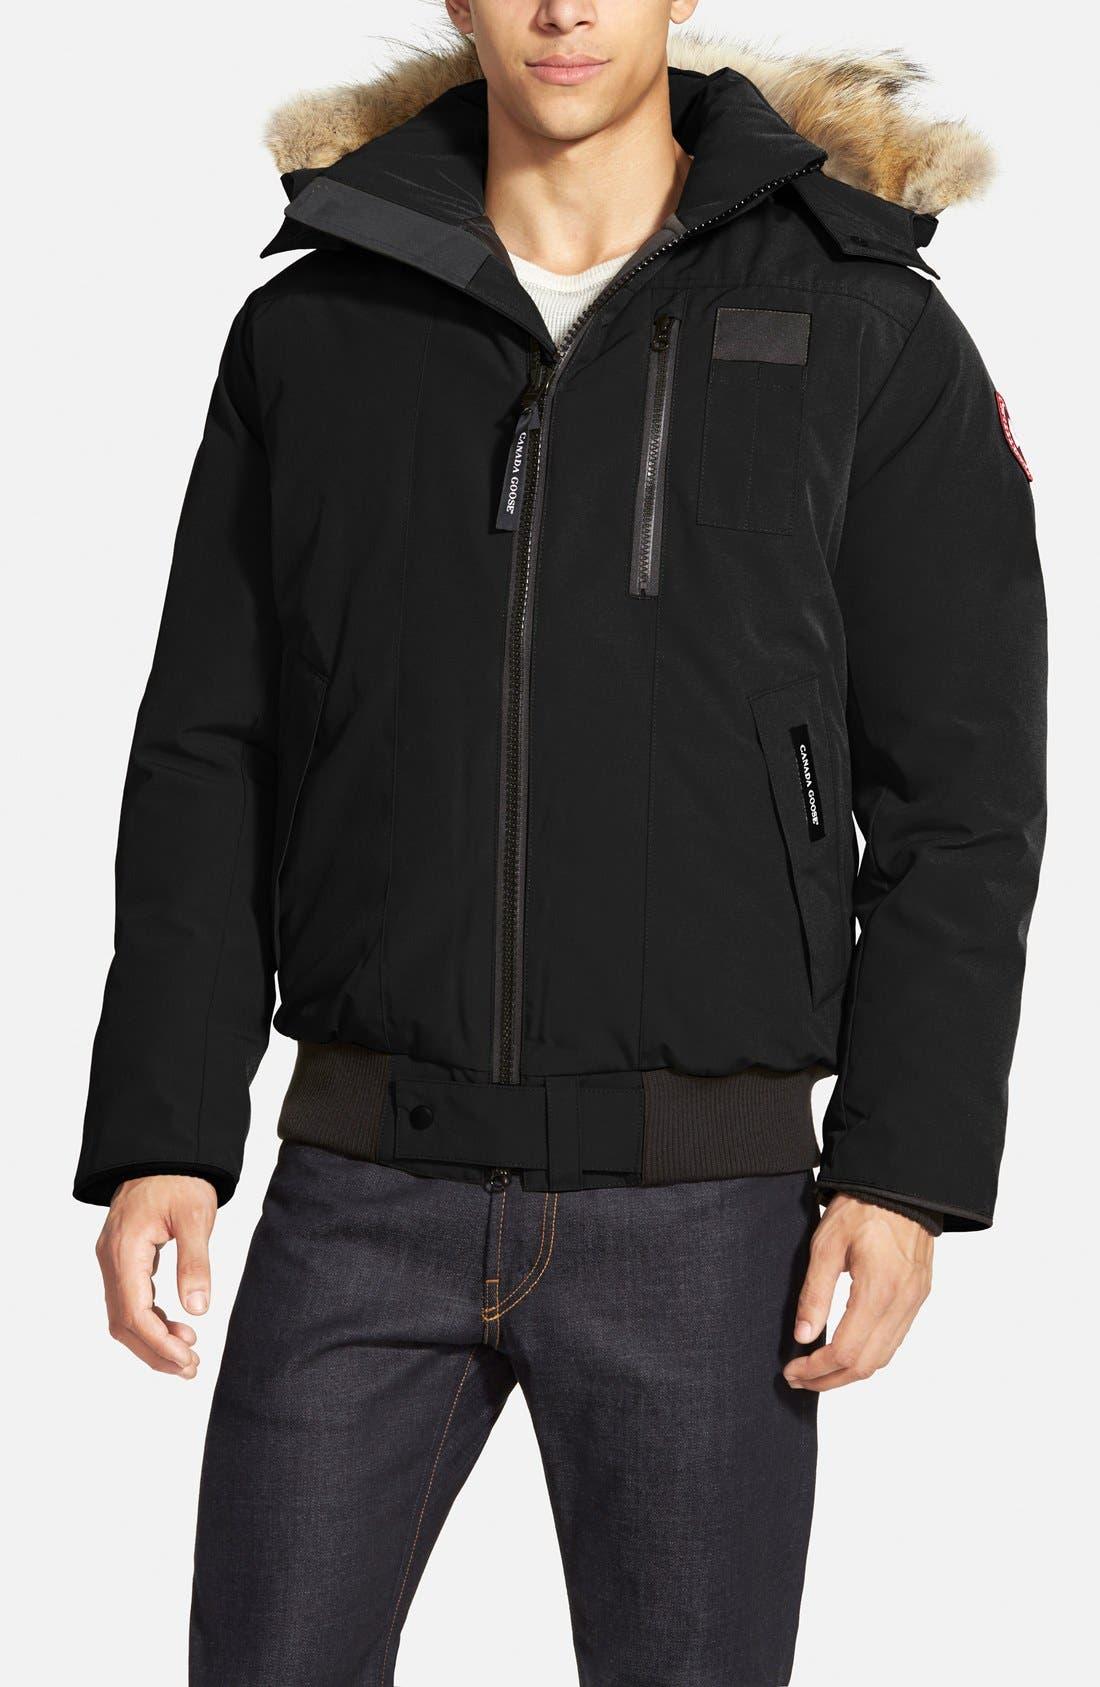 'Borden' Regular Fit Bomber Jacket with Genuine Coyote Trim,                         Main,                         color, Black